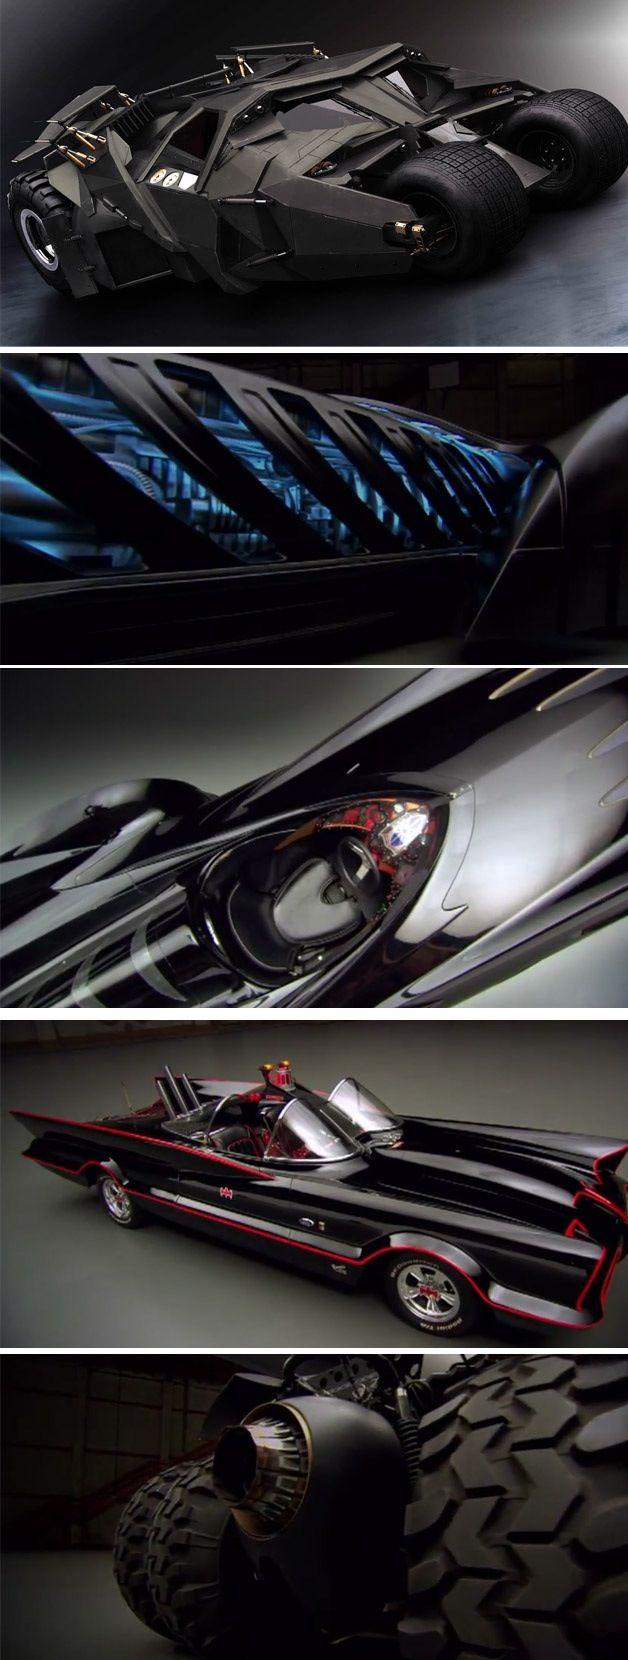 The bat mobiles